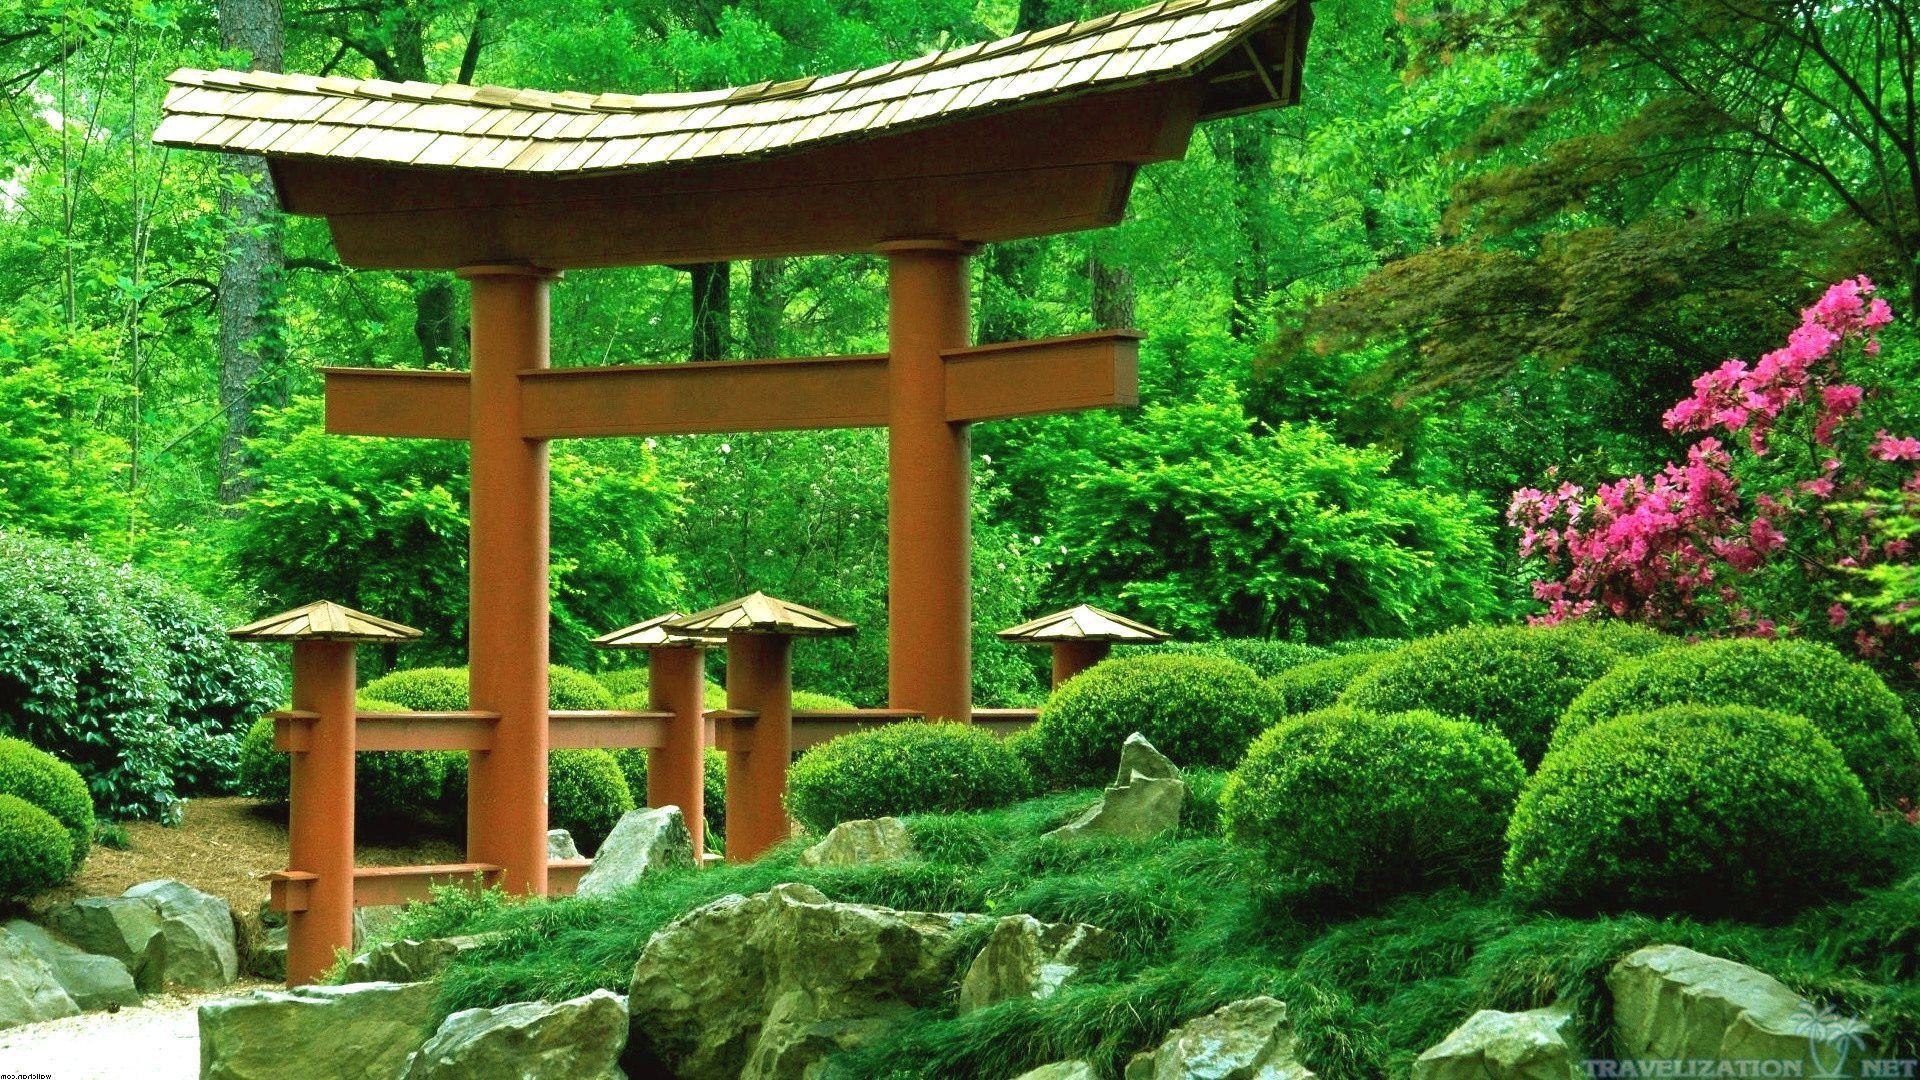 Taoian Japan Garden Wallpapers 1920x1080